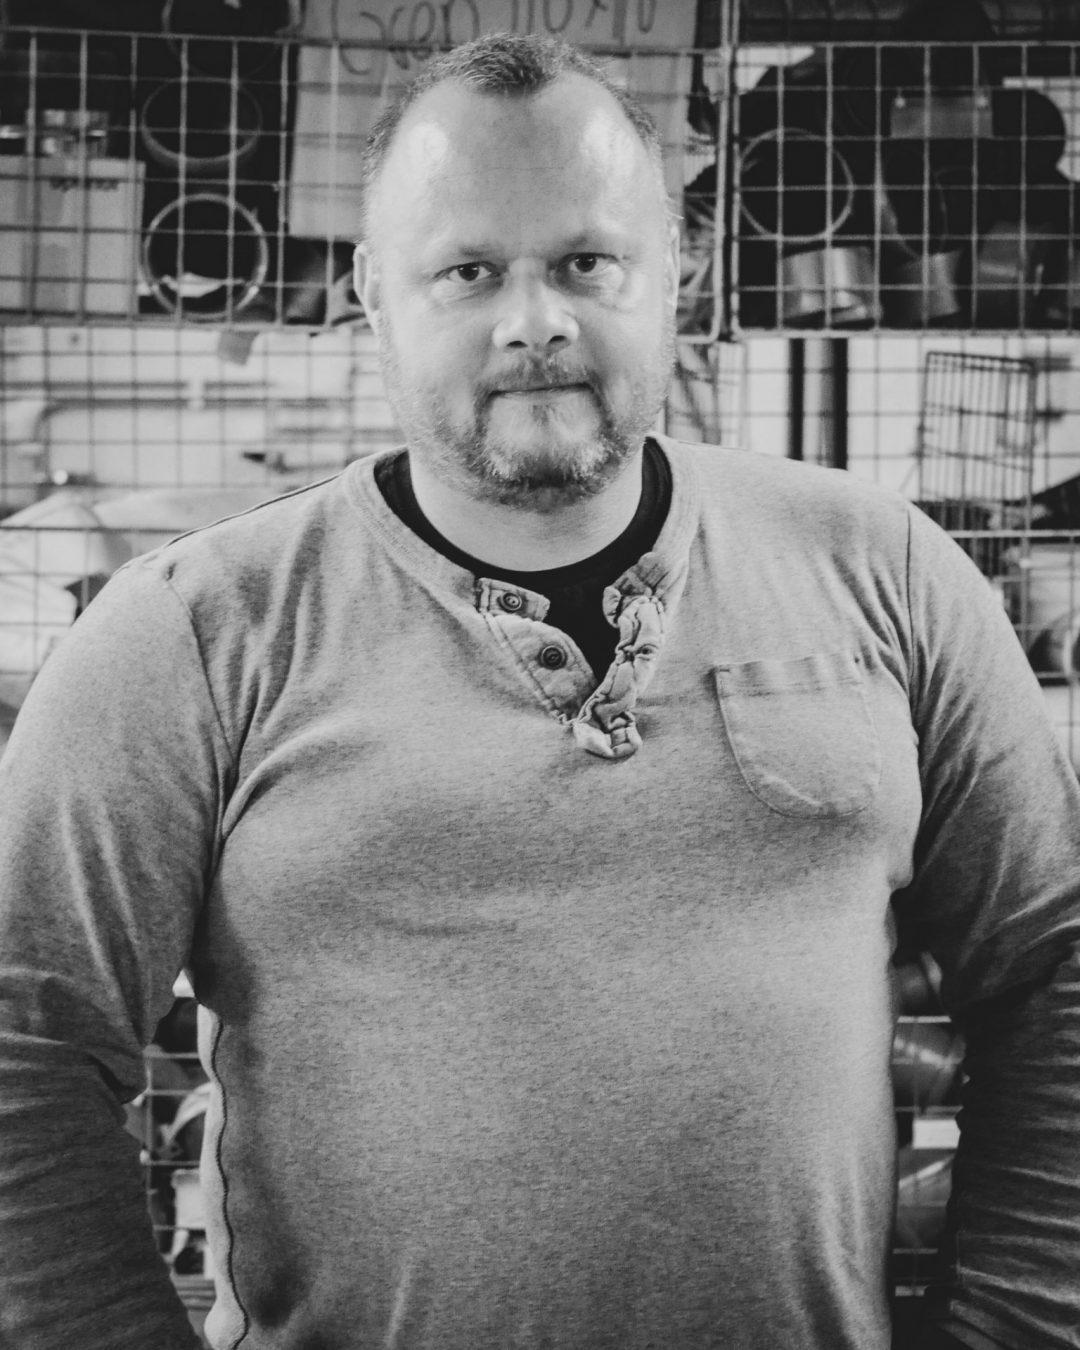 Jerry Jonsson